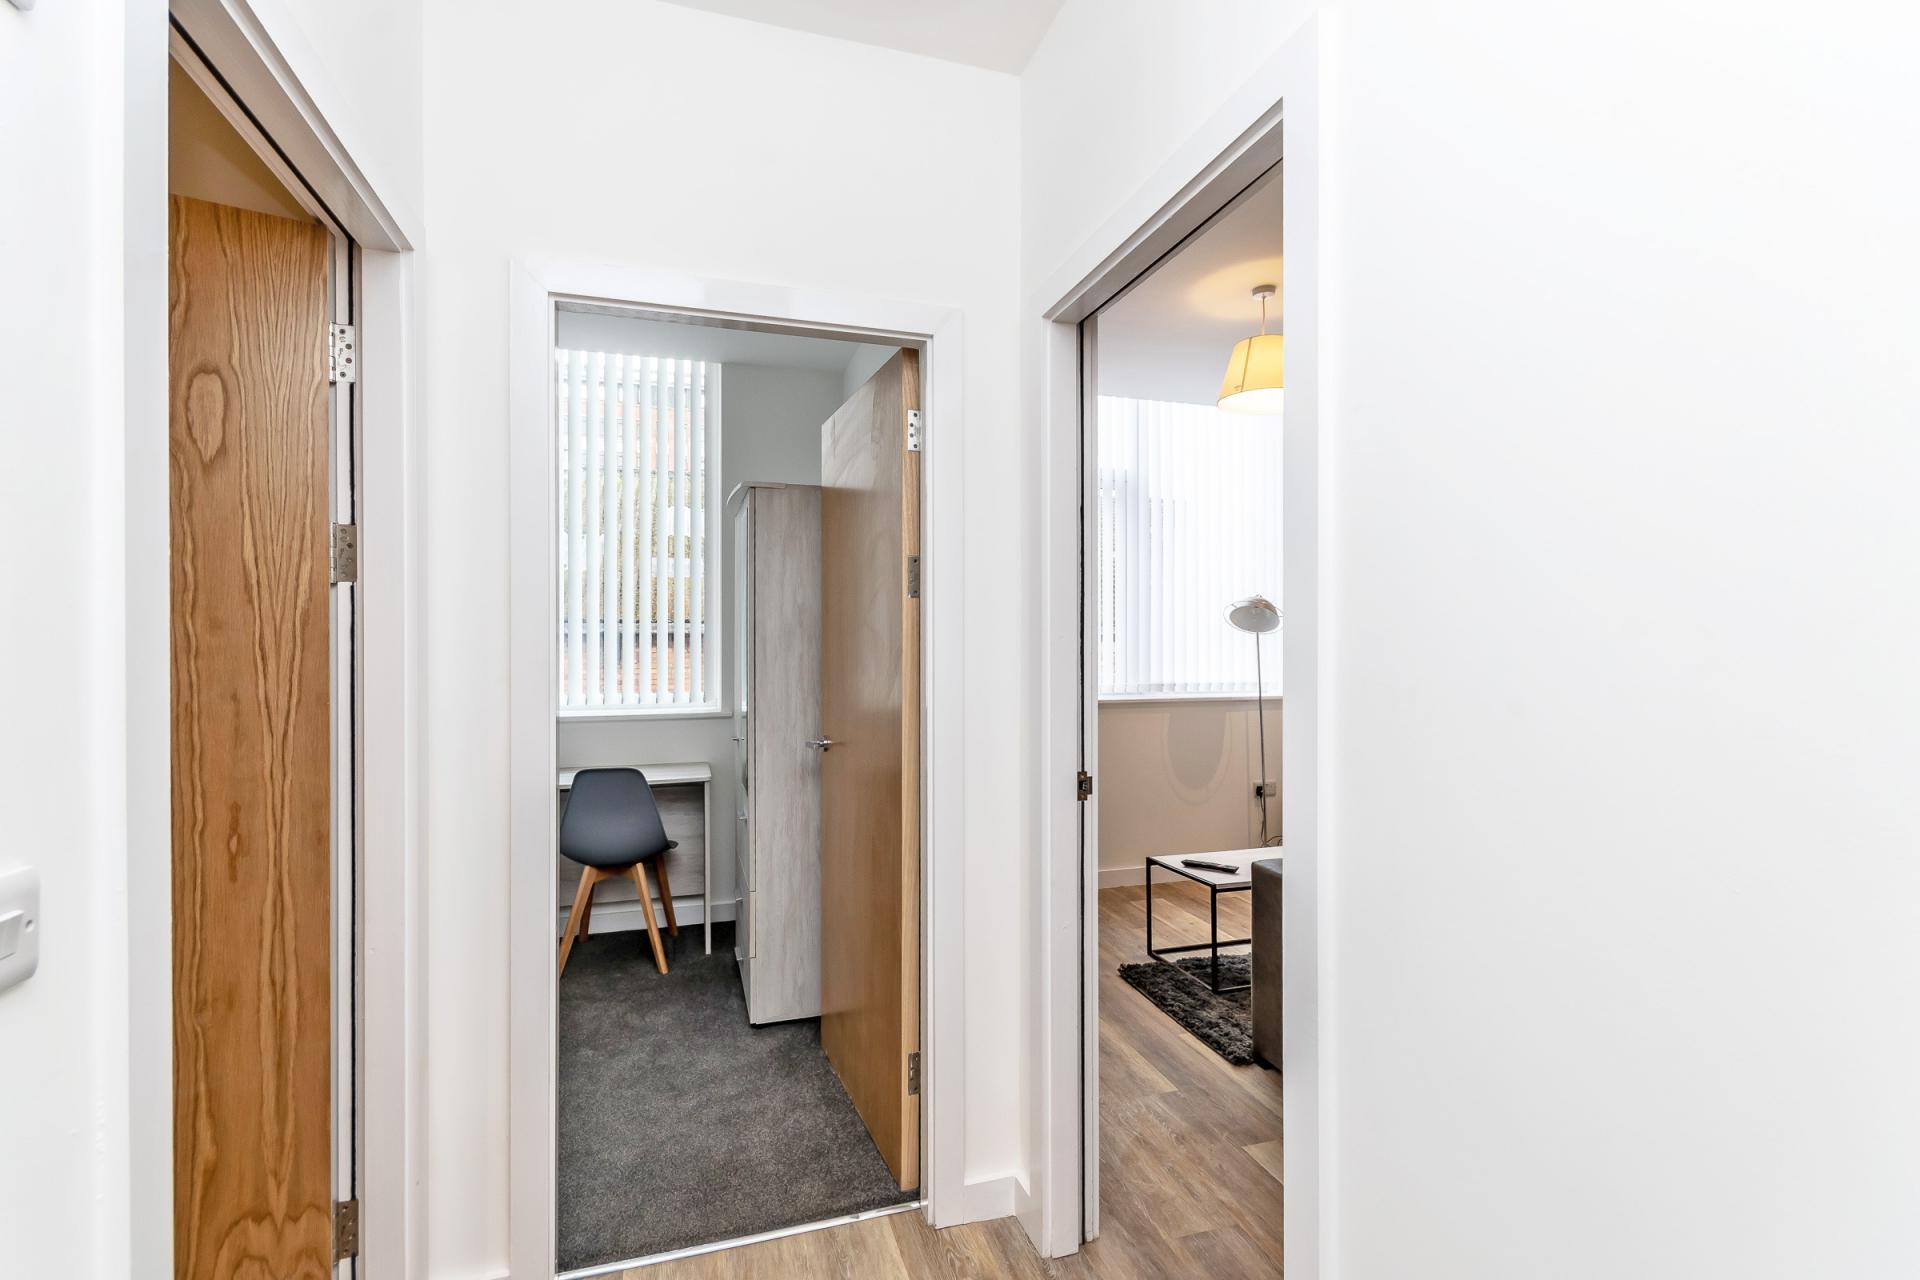 Hallway at City Suites Apartments